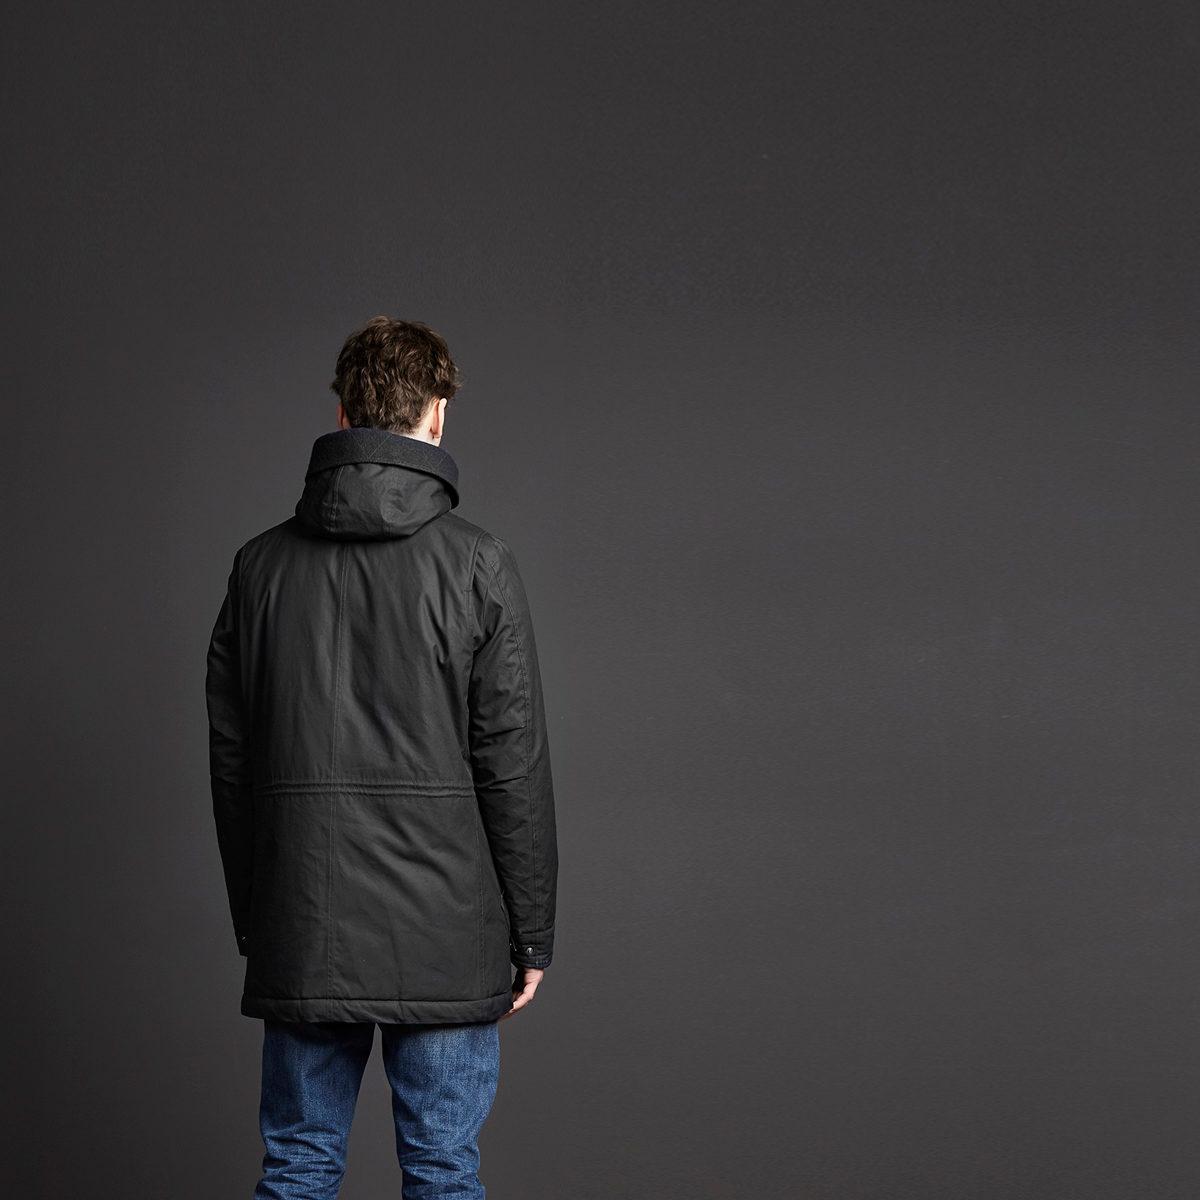 Havelock Parka Black. Herr vinterparka i ekologisk bomull, ylle & tencel från Langerchen.